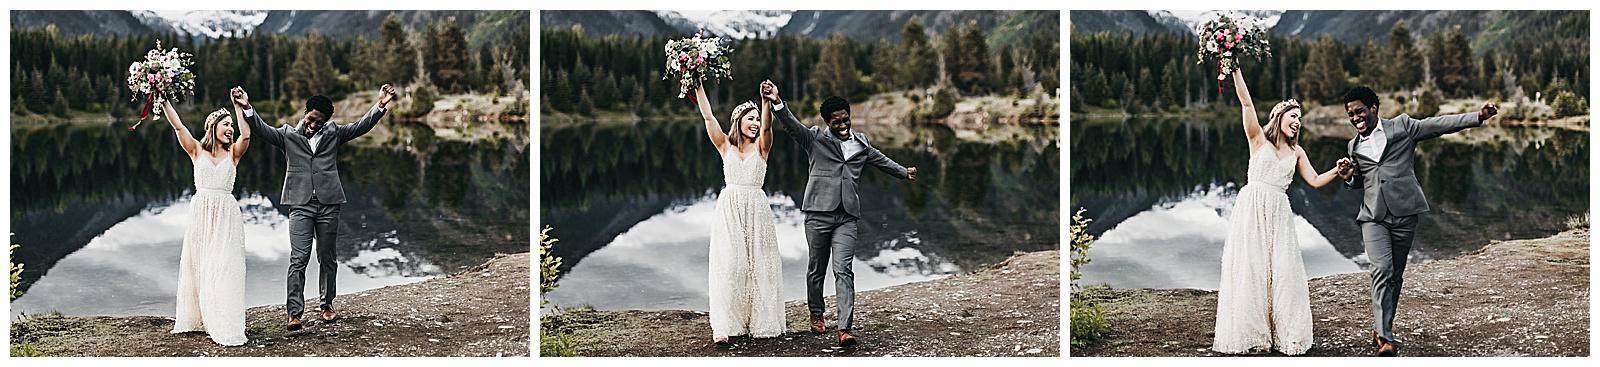 seattle-wedding-photographer-seattle-elopement-photographer-anniezav_0054.jpg